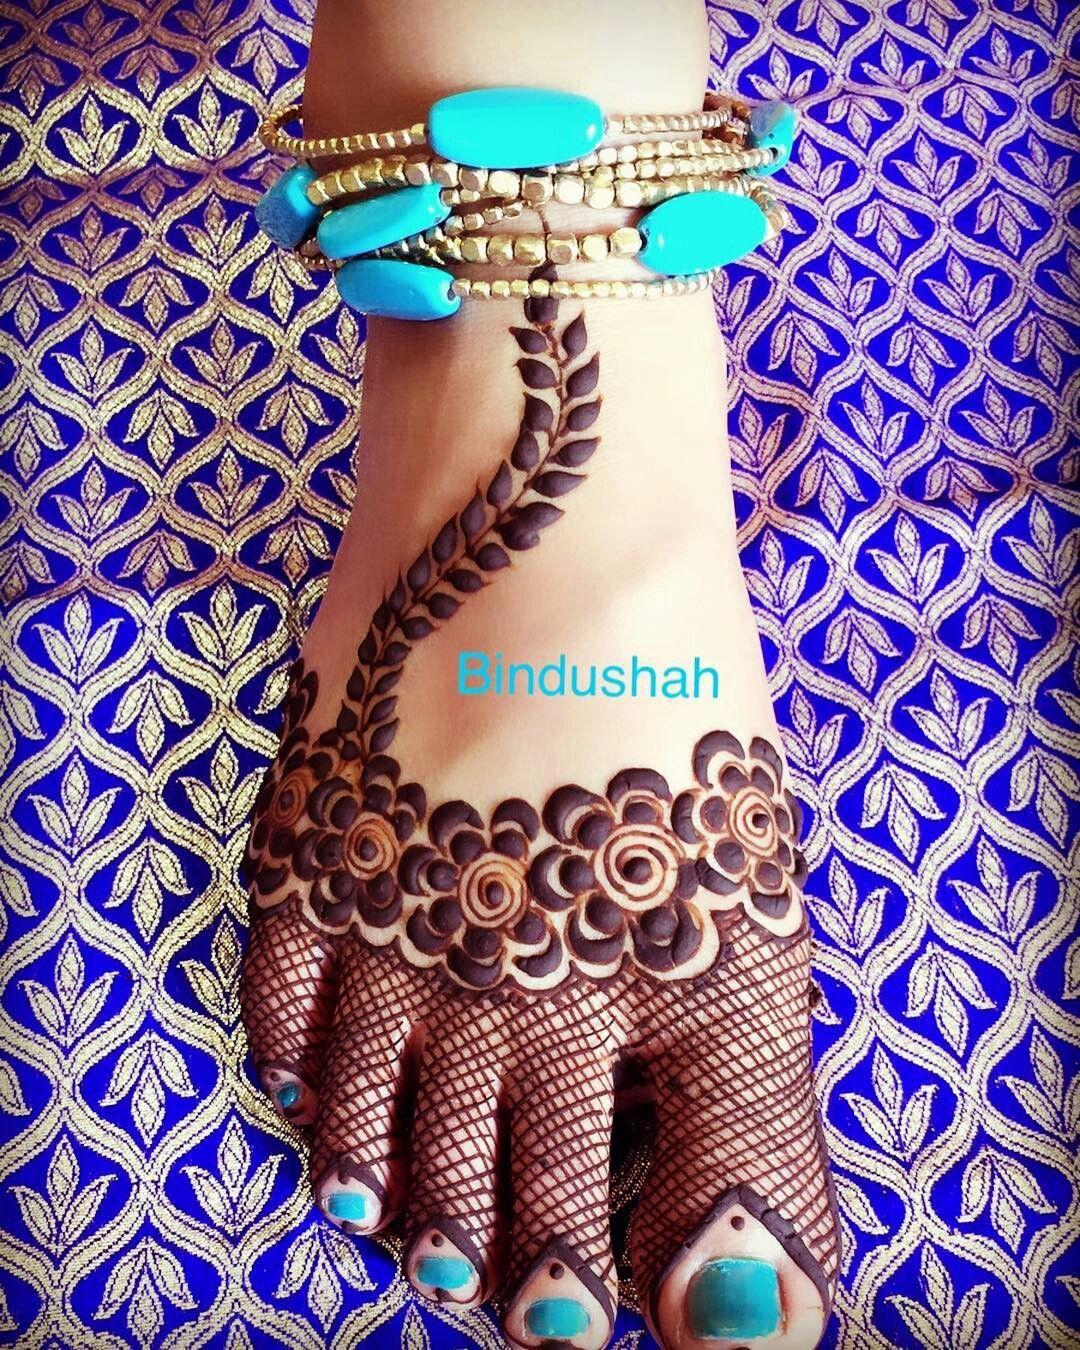 Images about mehndi design on pinterest mehndi - Feet Mehndi Design